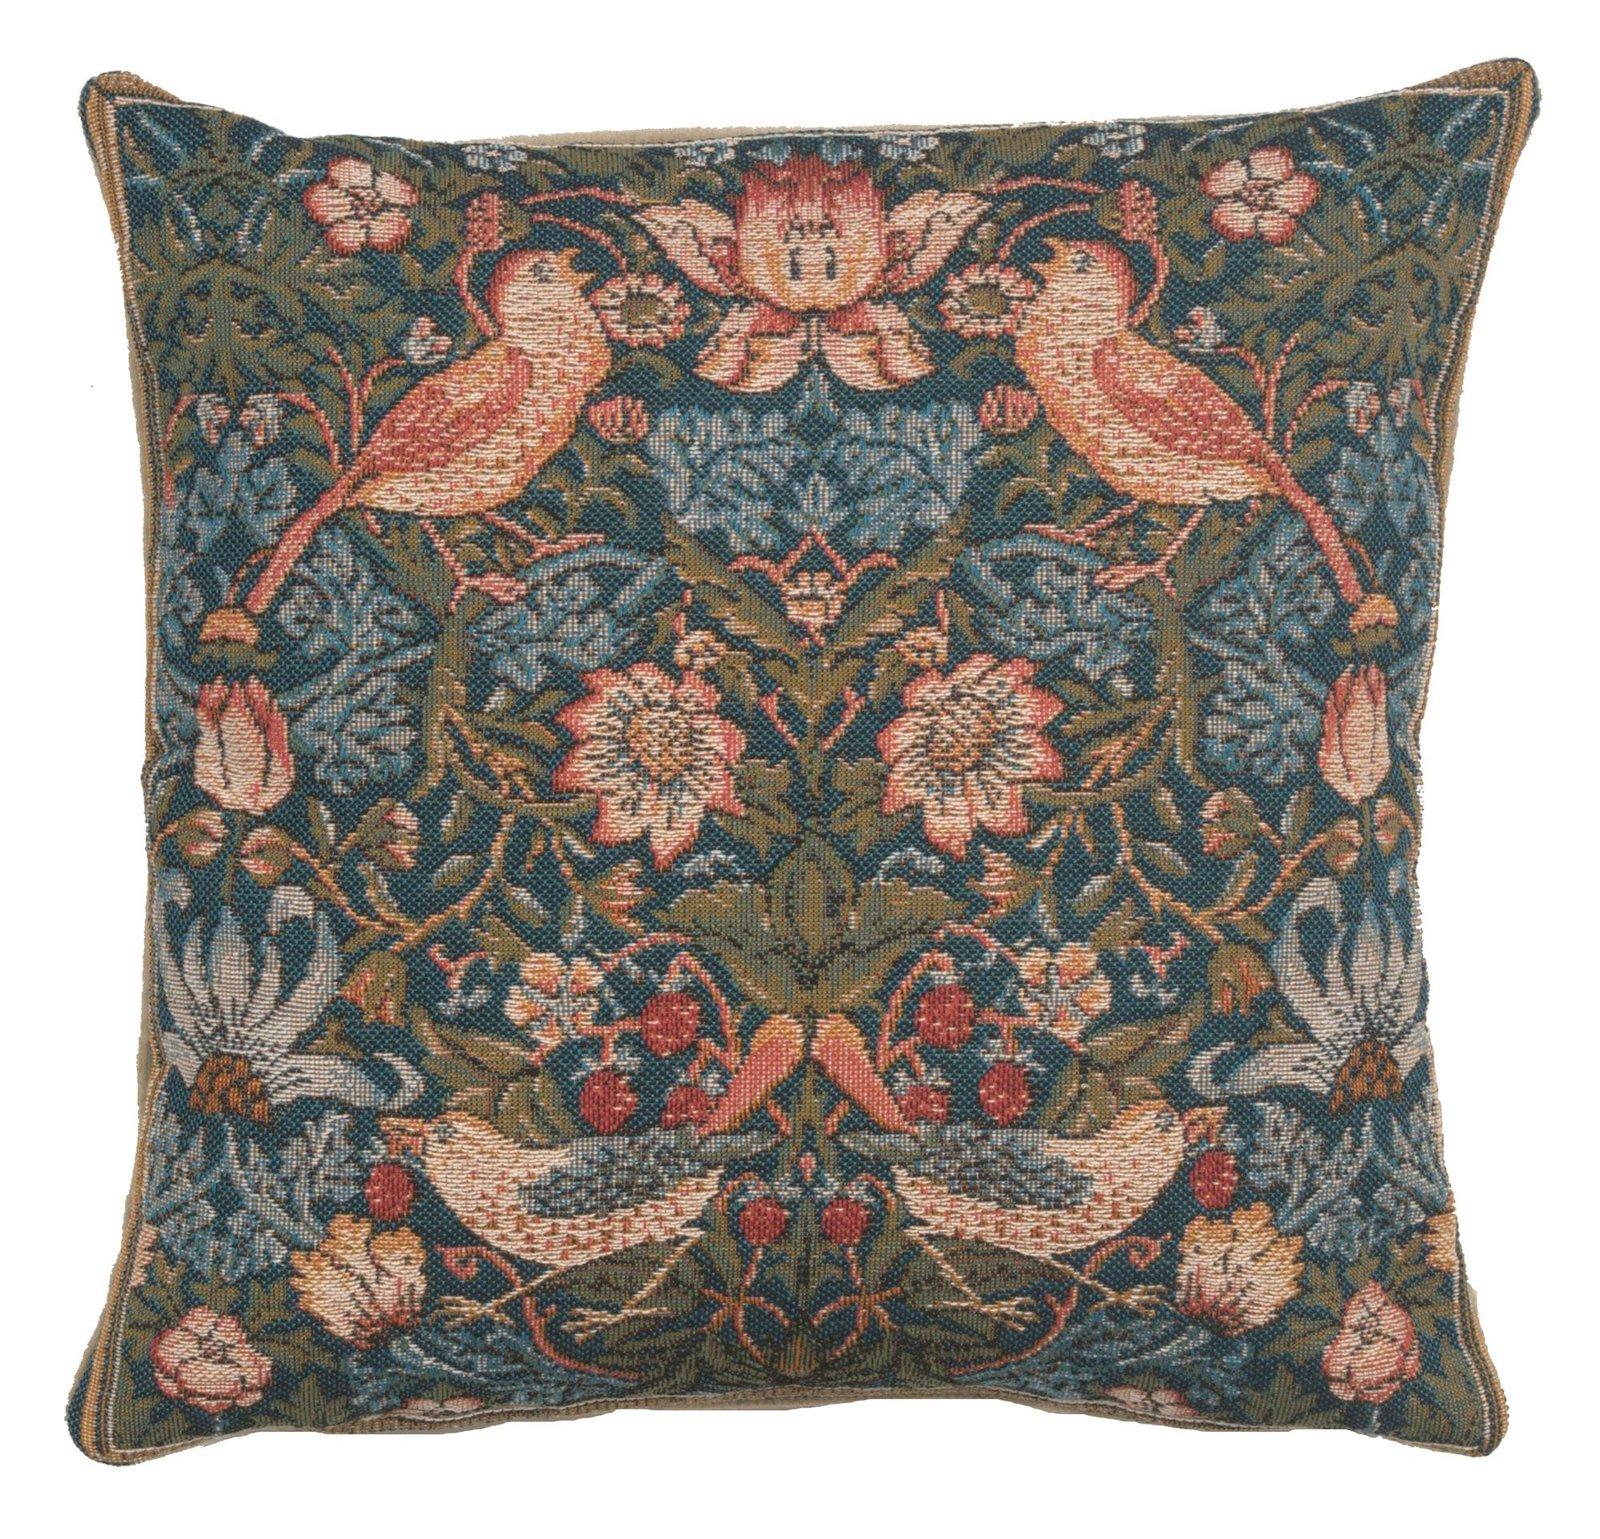 Cushion Birds Face to Face European Cushion